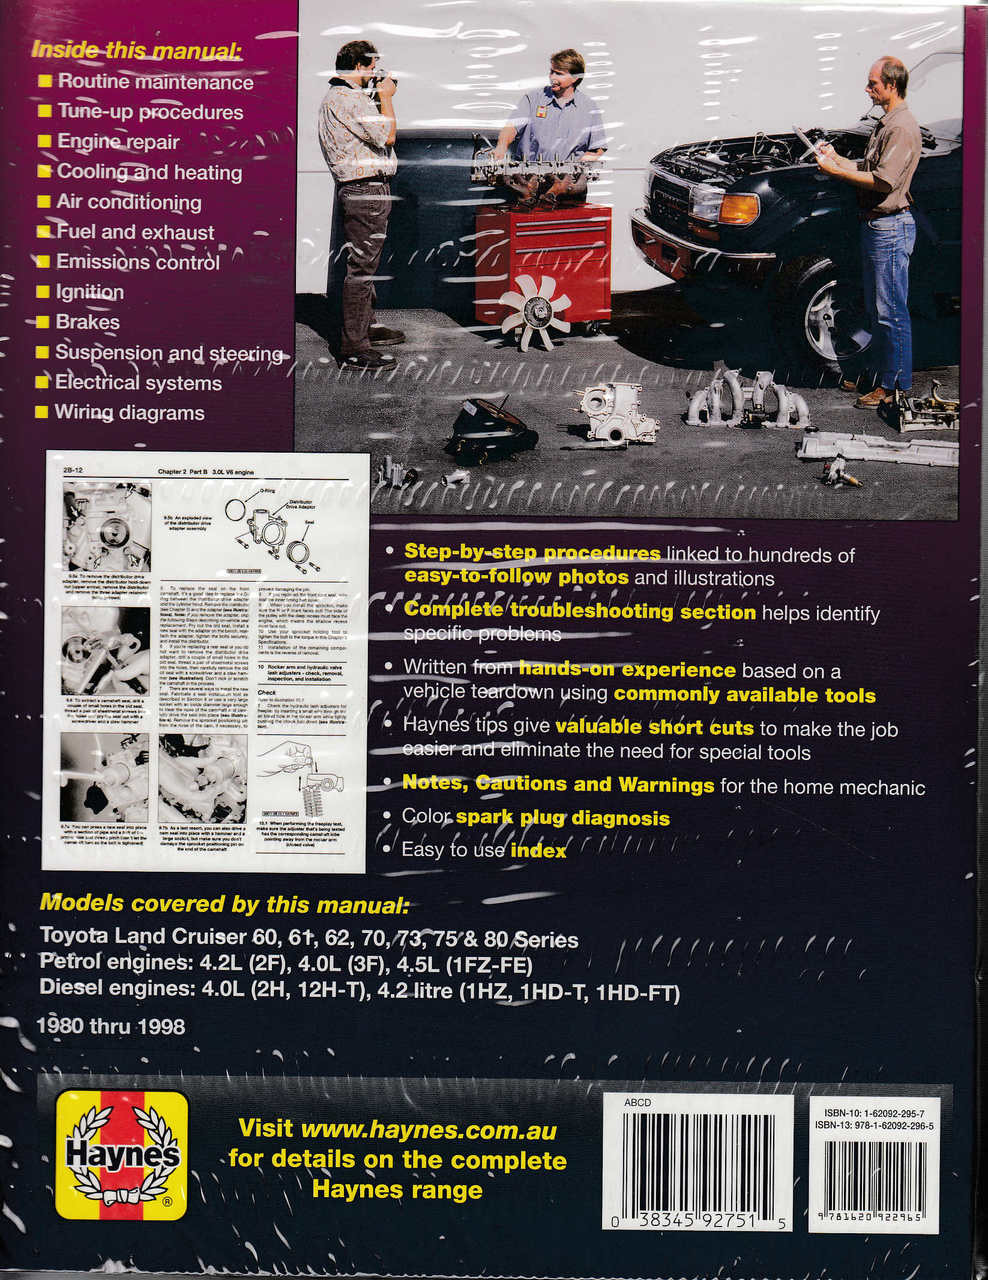 Toyota Land Cruiser Fj And Fzj Series Petrol Diesel 1980 1998 Wiring Diagram 1987 Fj60 Amp Workshop Manual